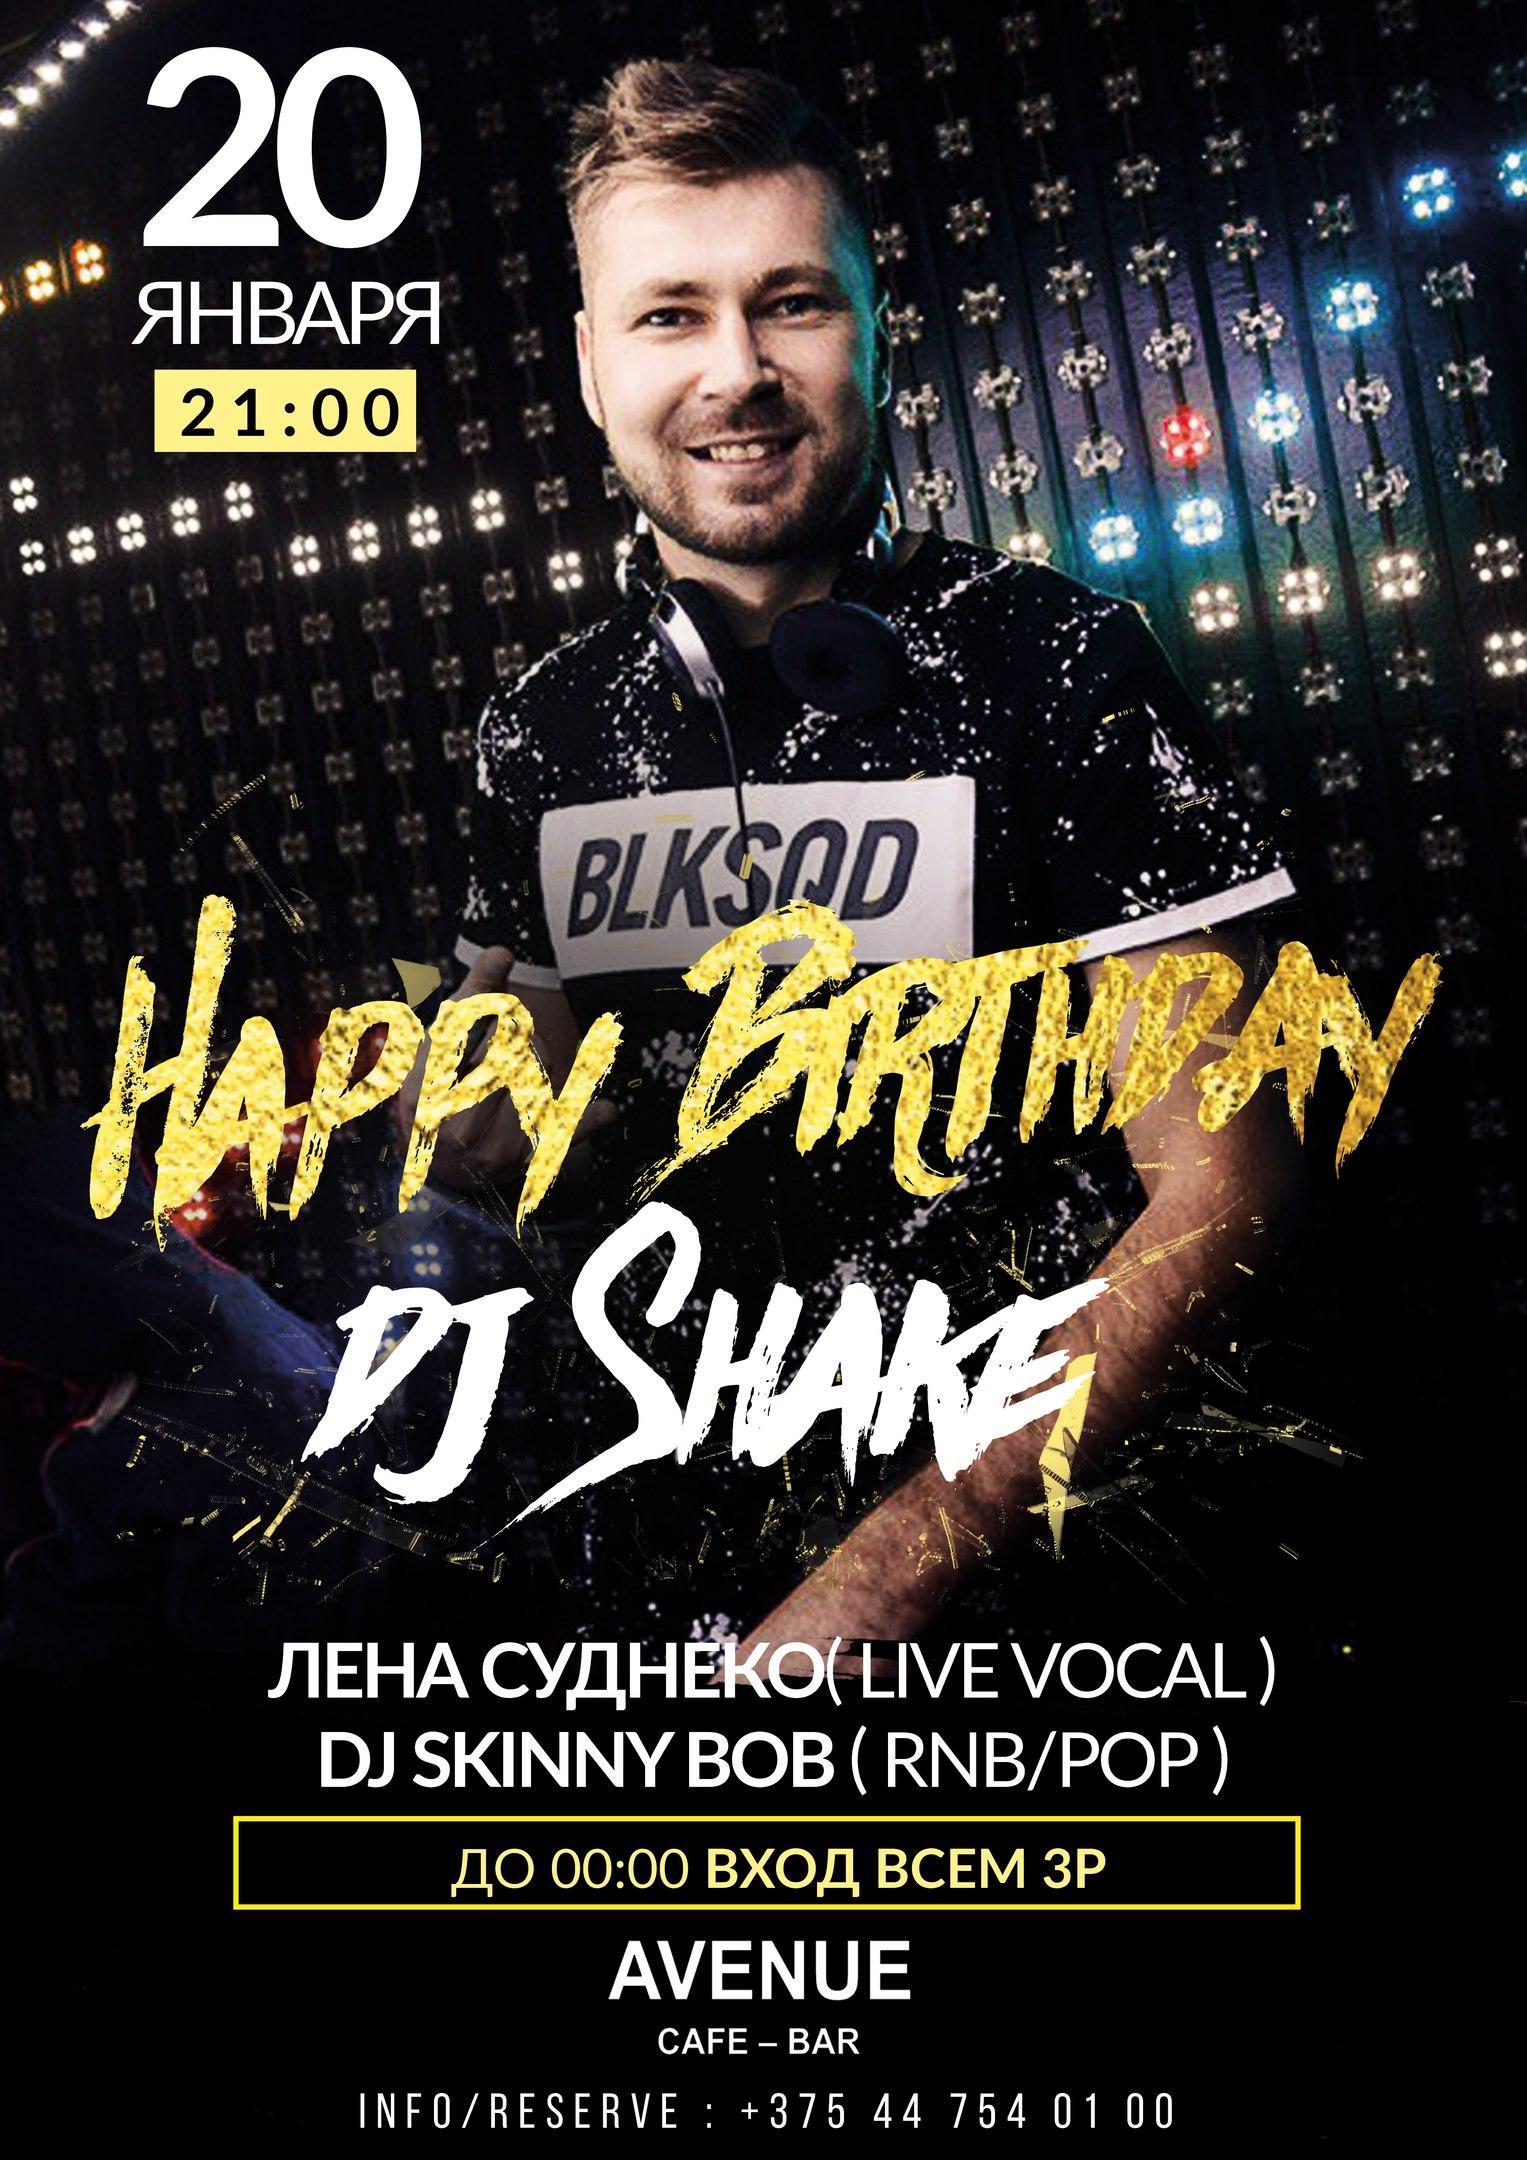 Афиша вечеринки DJ Shake в кафе Avenue